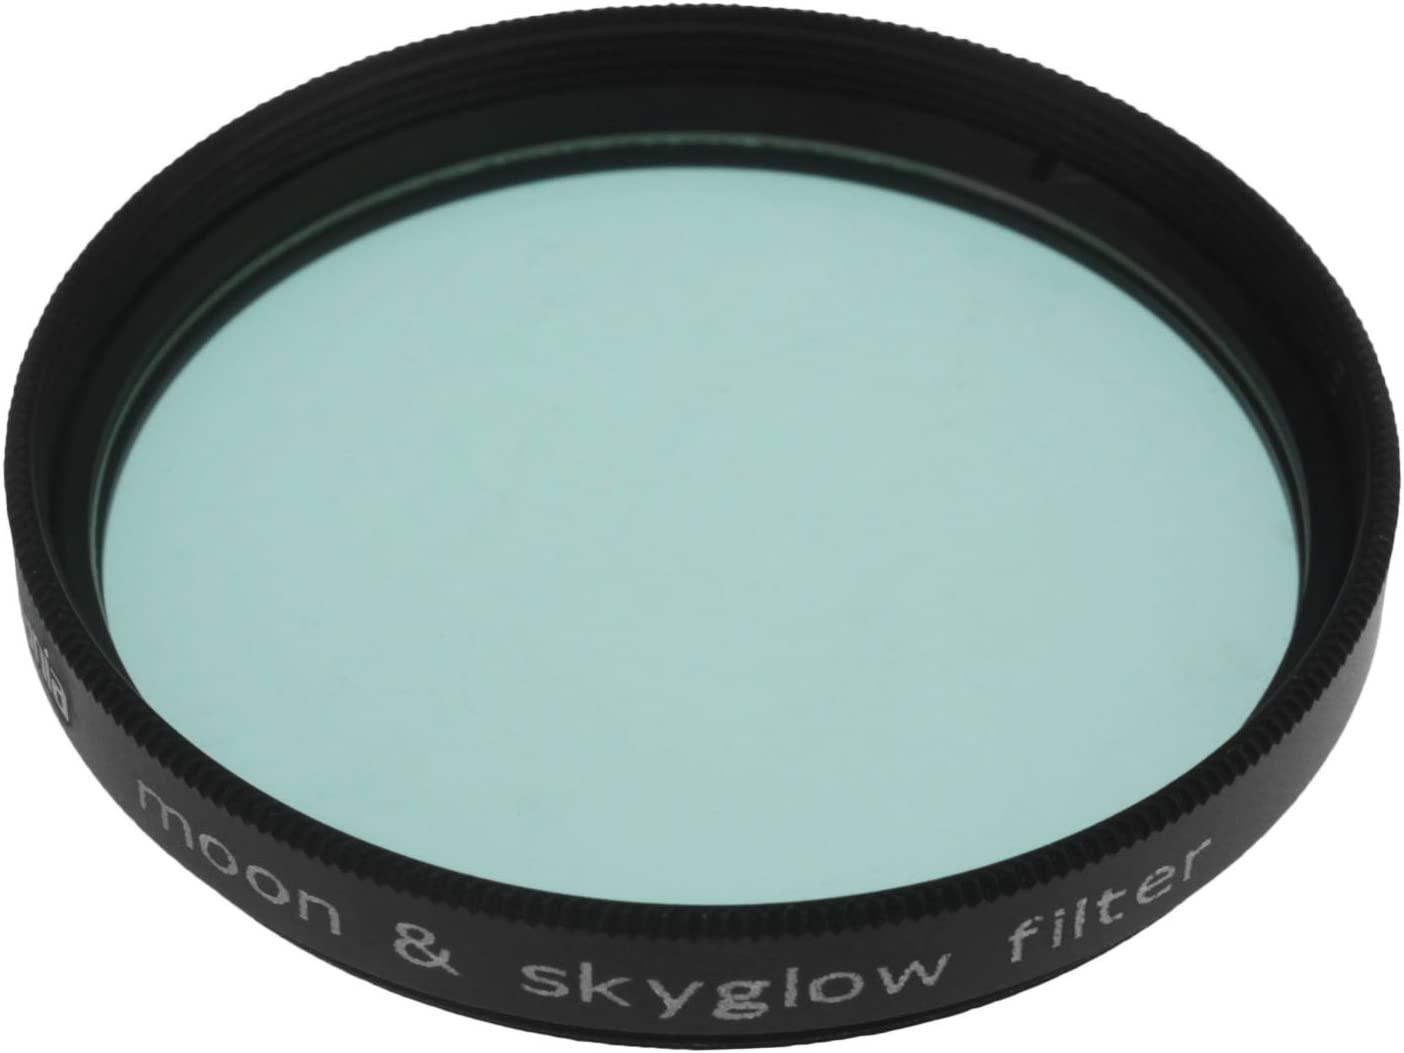 MrStarGuy QMS404Y 2  Moon Sky-Glow Filter Black